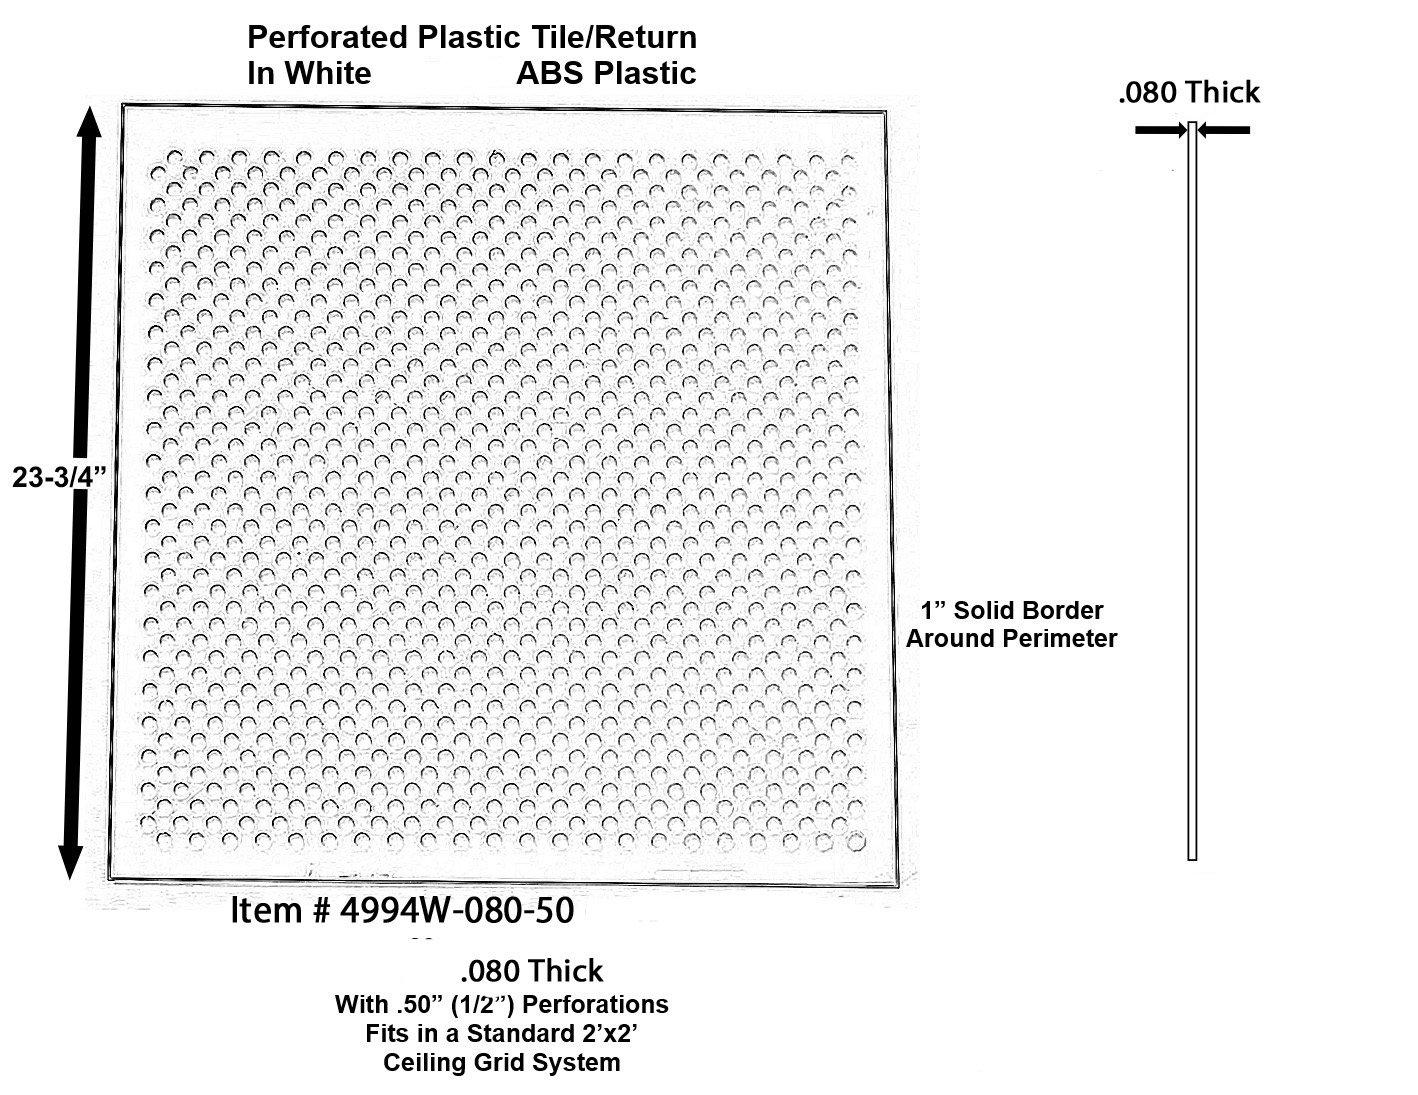 Amazon white plastic perforated tilereturn with 12 amazon white plastic perforated tilereturn with 12 perforations 4994w 125 50 home kitchen dailygadgetfo Choice Image